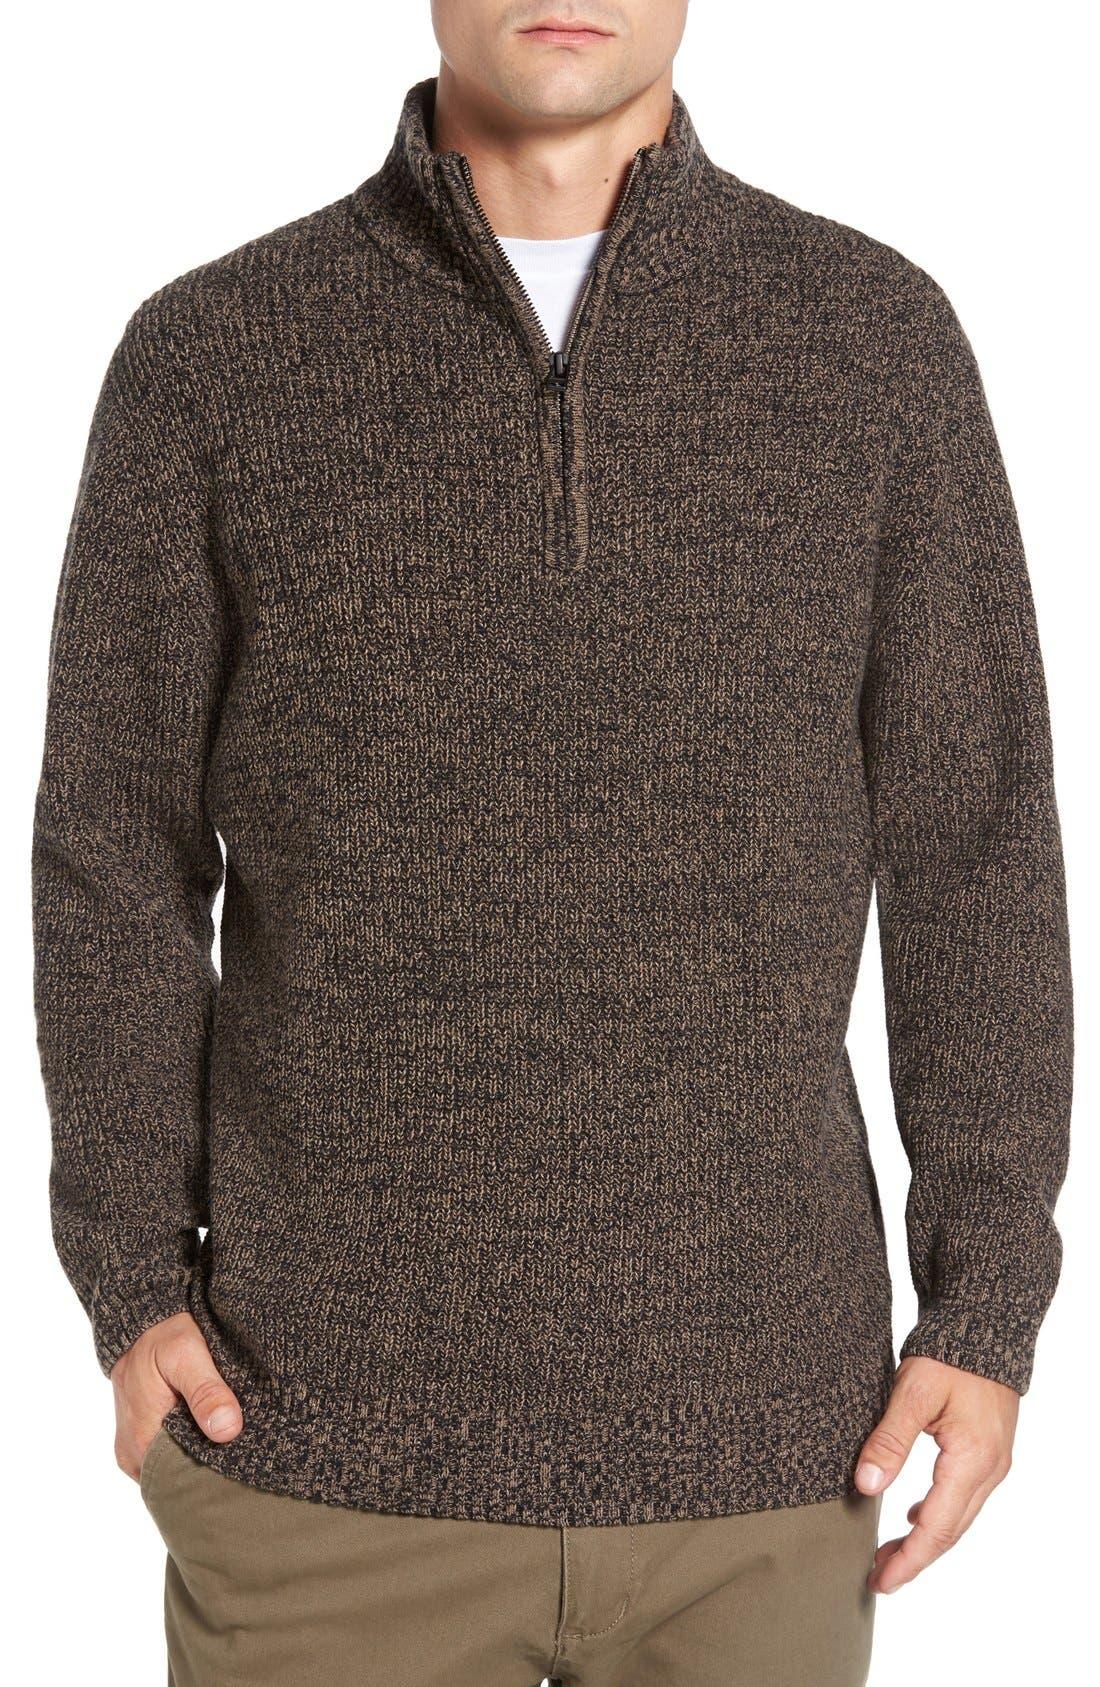 'Woodglen' Herringbone Knit Lambswool Quarter Zip Sweater,                             Main thumbnail 1, color,                             Walnut